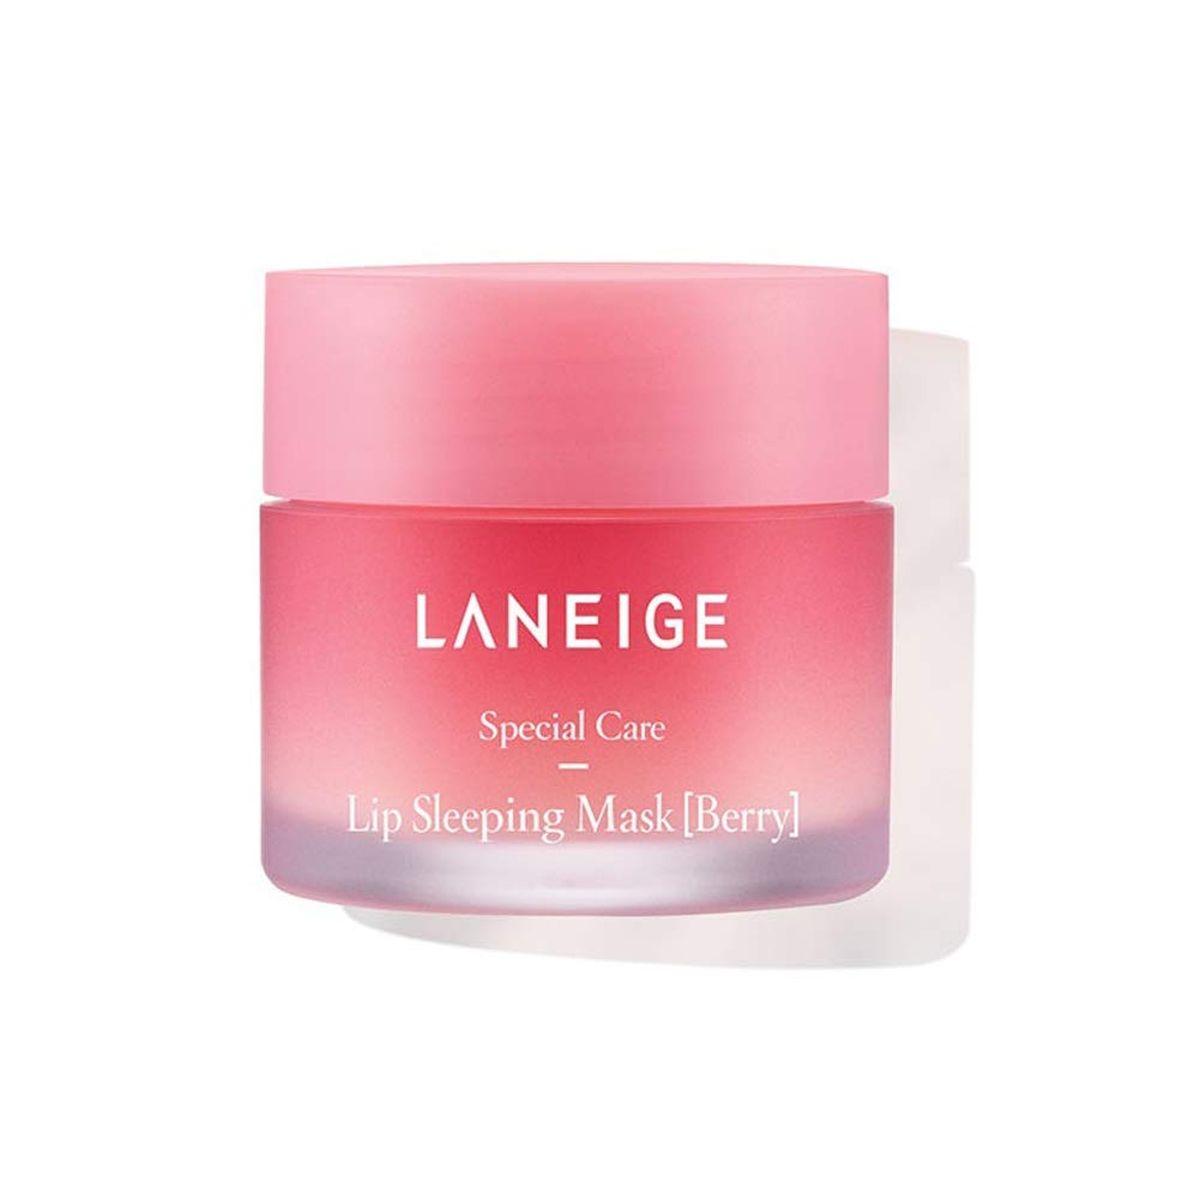 Ночная маска для губ с ягодами Laneige Lip Sleeping Mask Berry - 8 гр